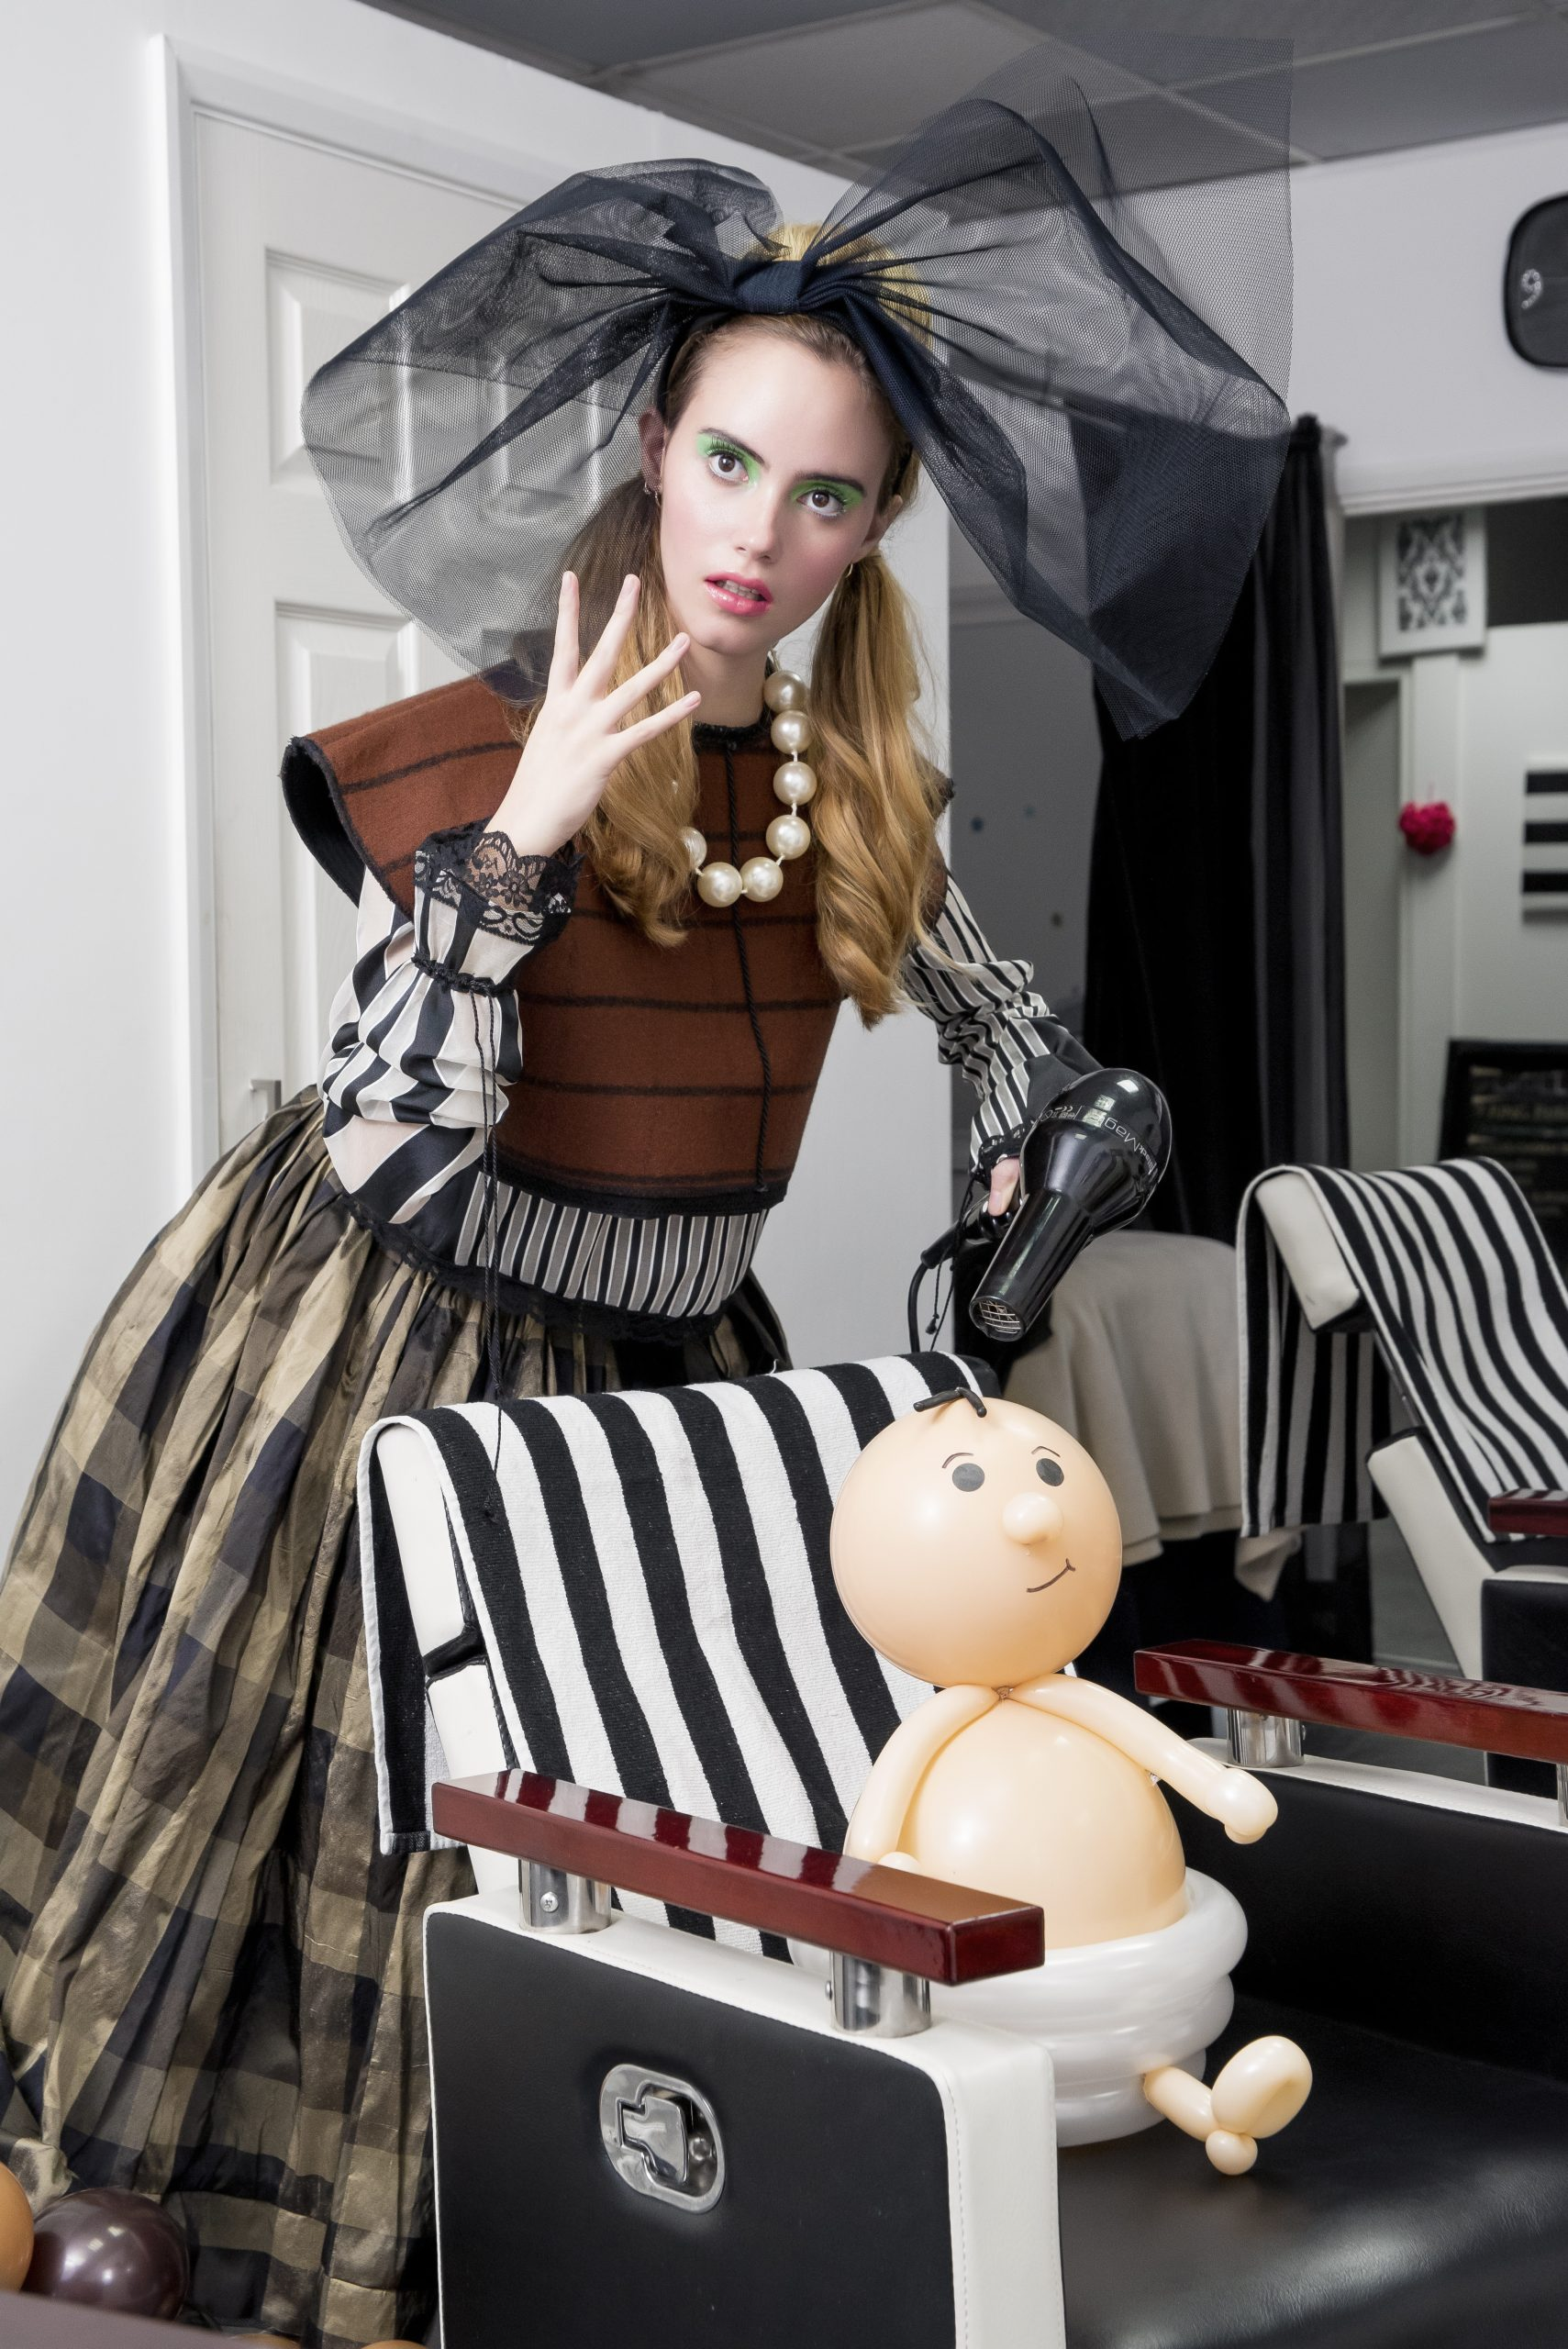 Hair and Makeup: Simone Graham Photographer: Emma-Jane Photography Models: Alice Rosano and Alexandra Smith Balloon artist: Natahsha Nordin @Airlegance Balloons Designer: Maurice M Connelly